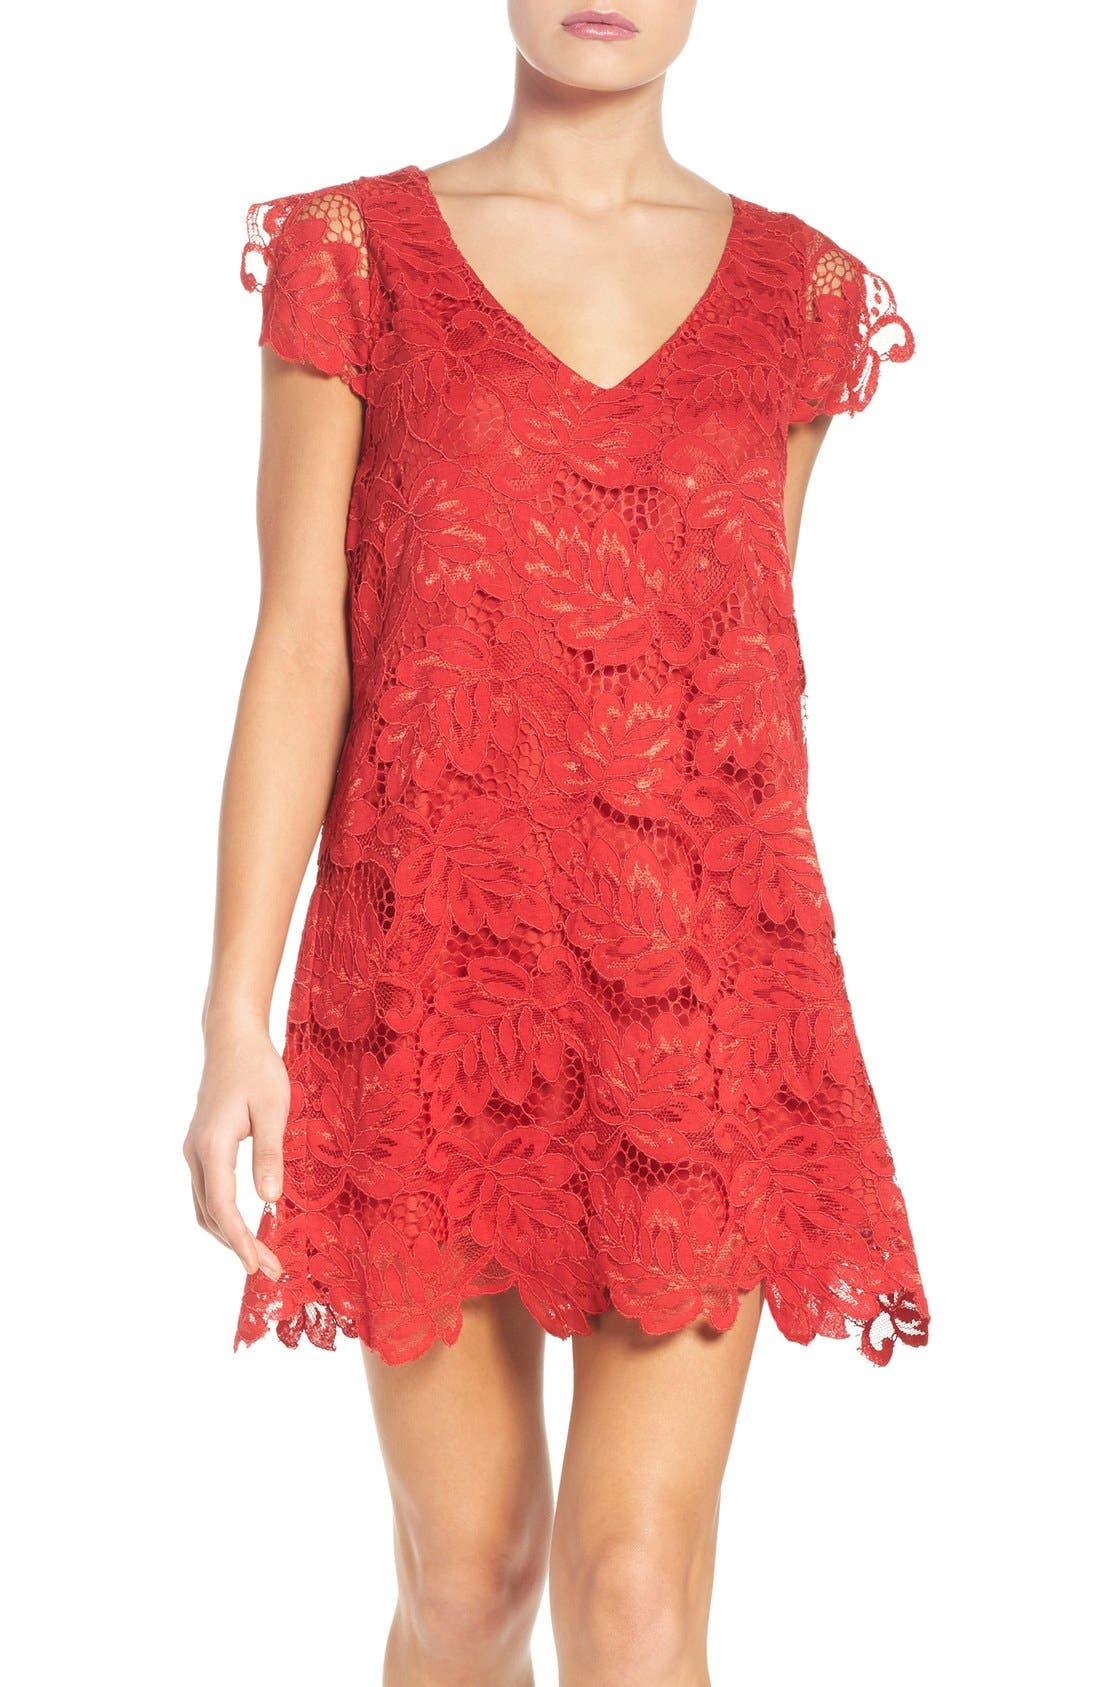 Alternate Image 1 Selected - BB Dakota 'Jacqueline' Lace Shift Dress